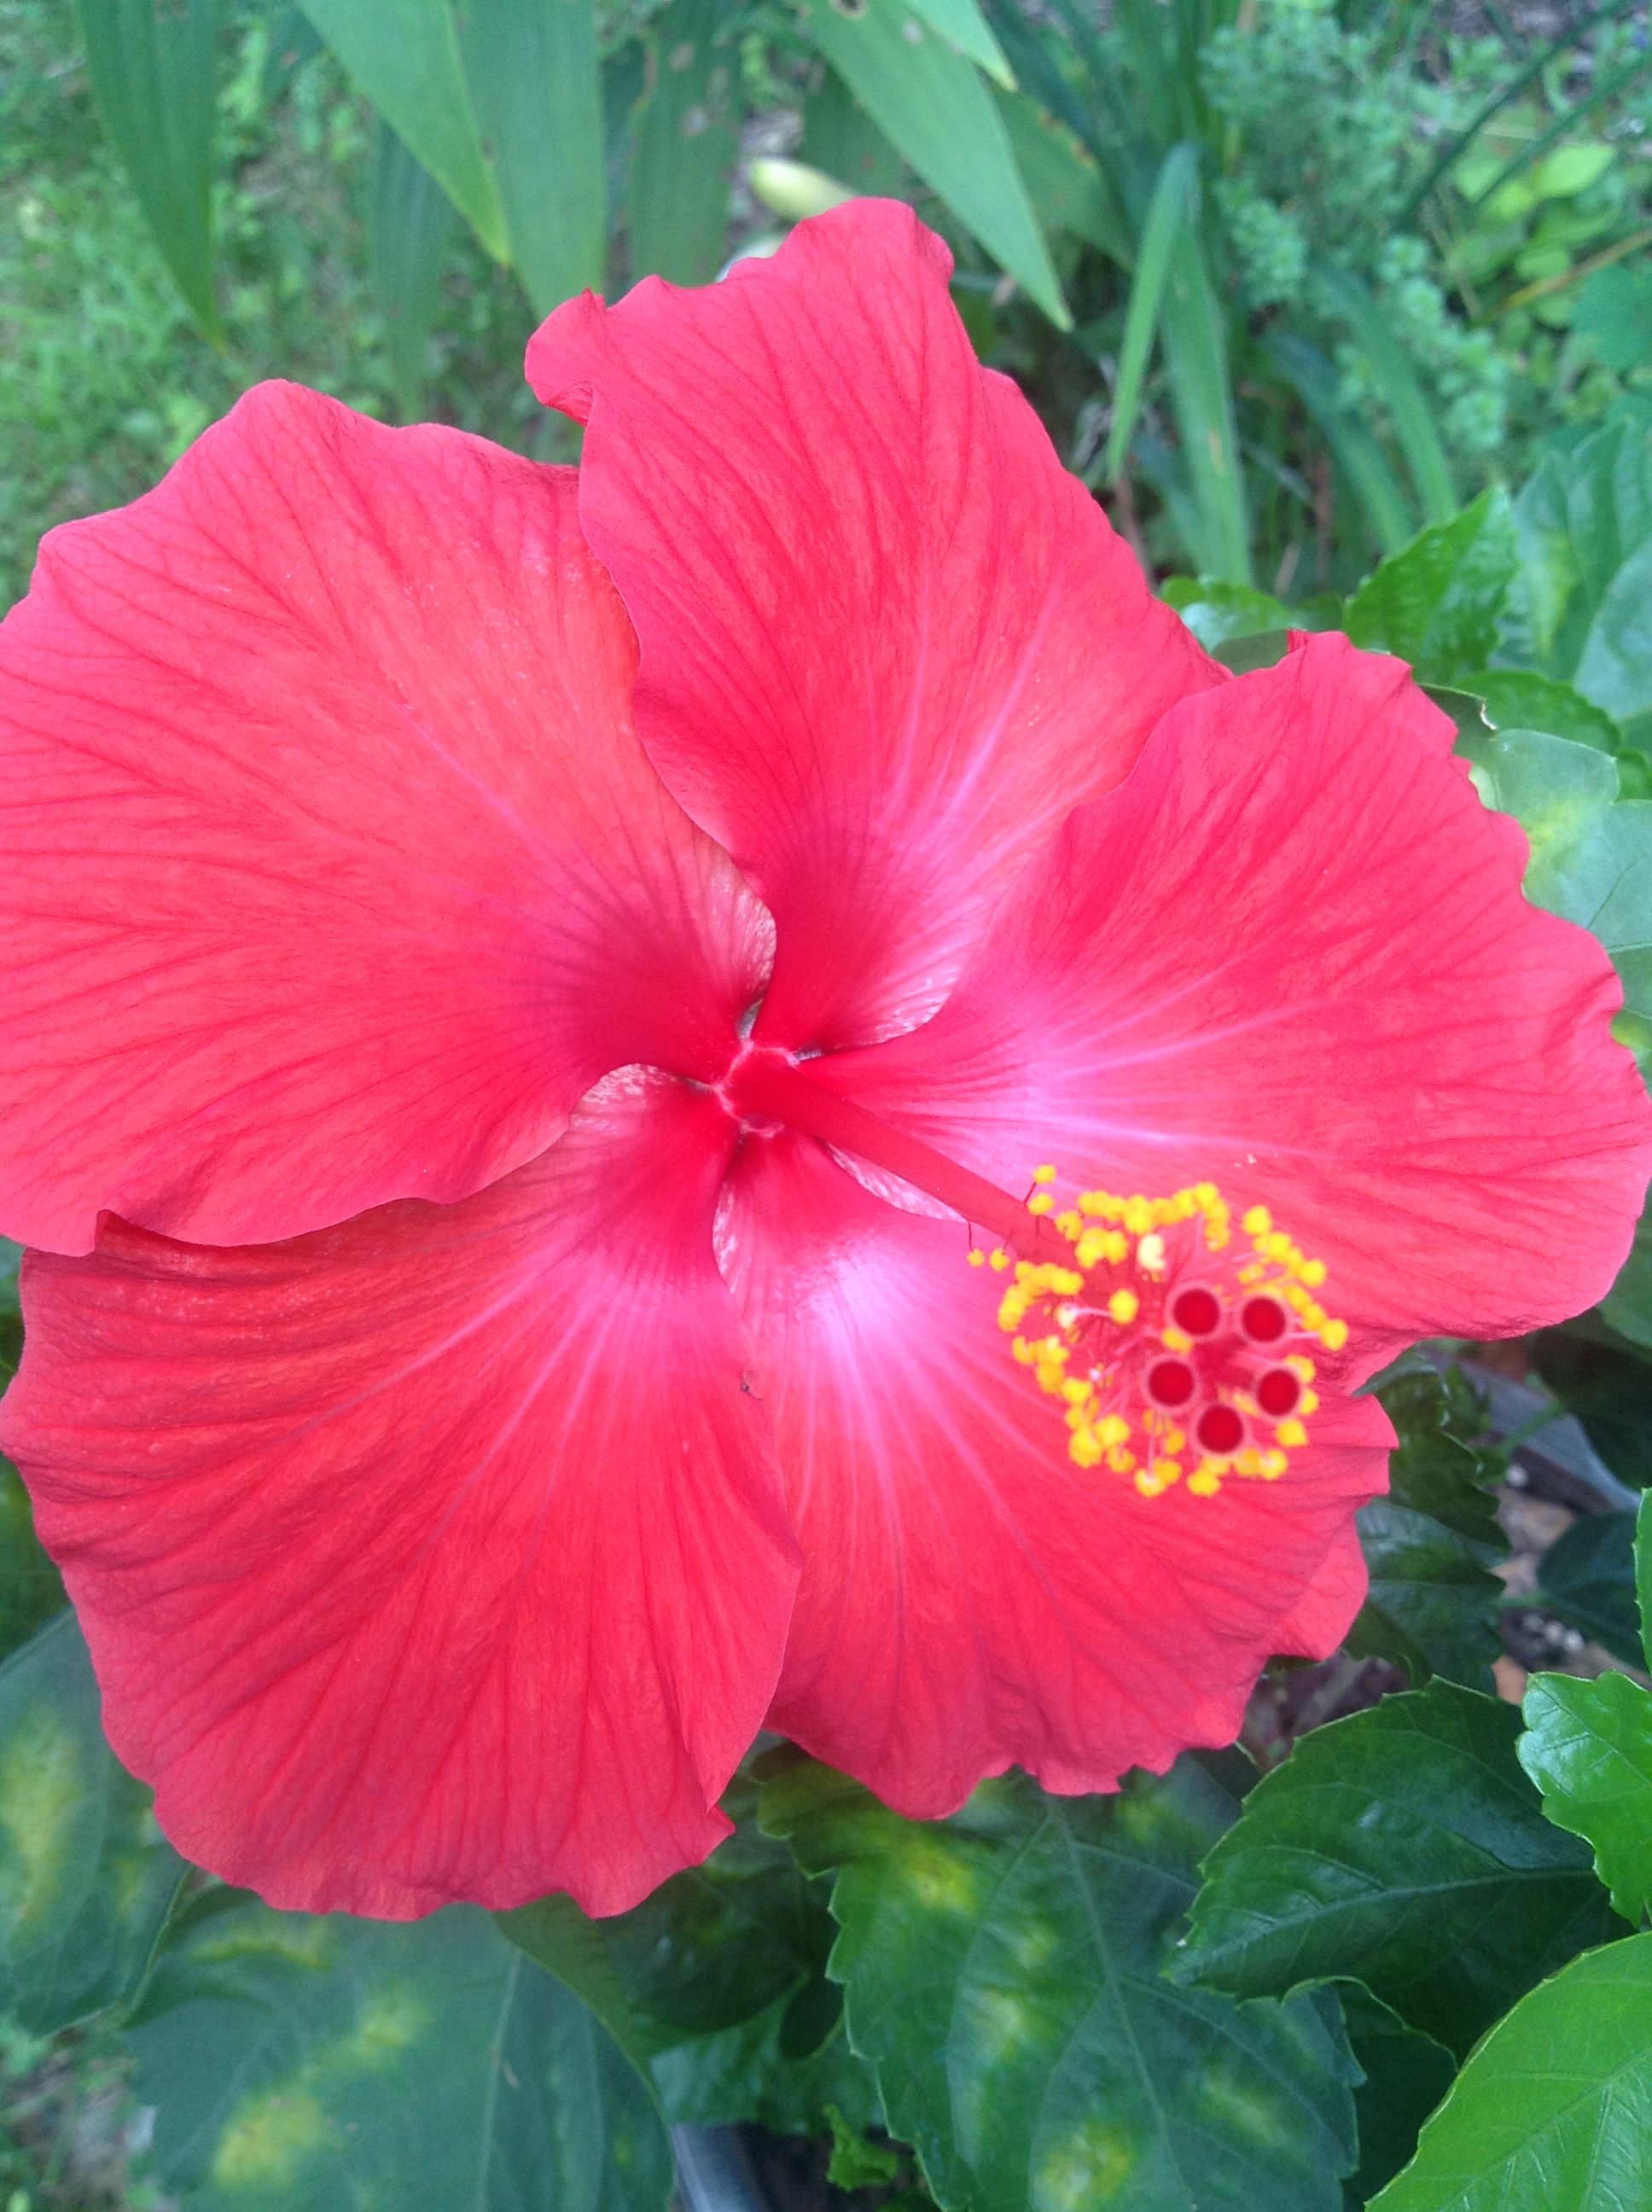 Lord ganeshas fave flower red hibiscus flower jaswanti lord ganeshas fave flower red hibiscus flower jaswanti izmirmasajfo